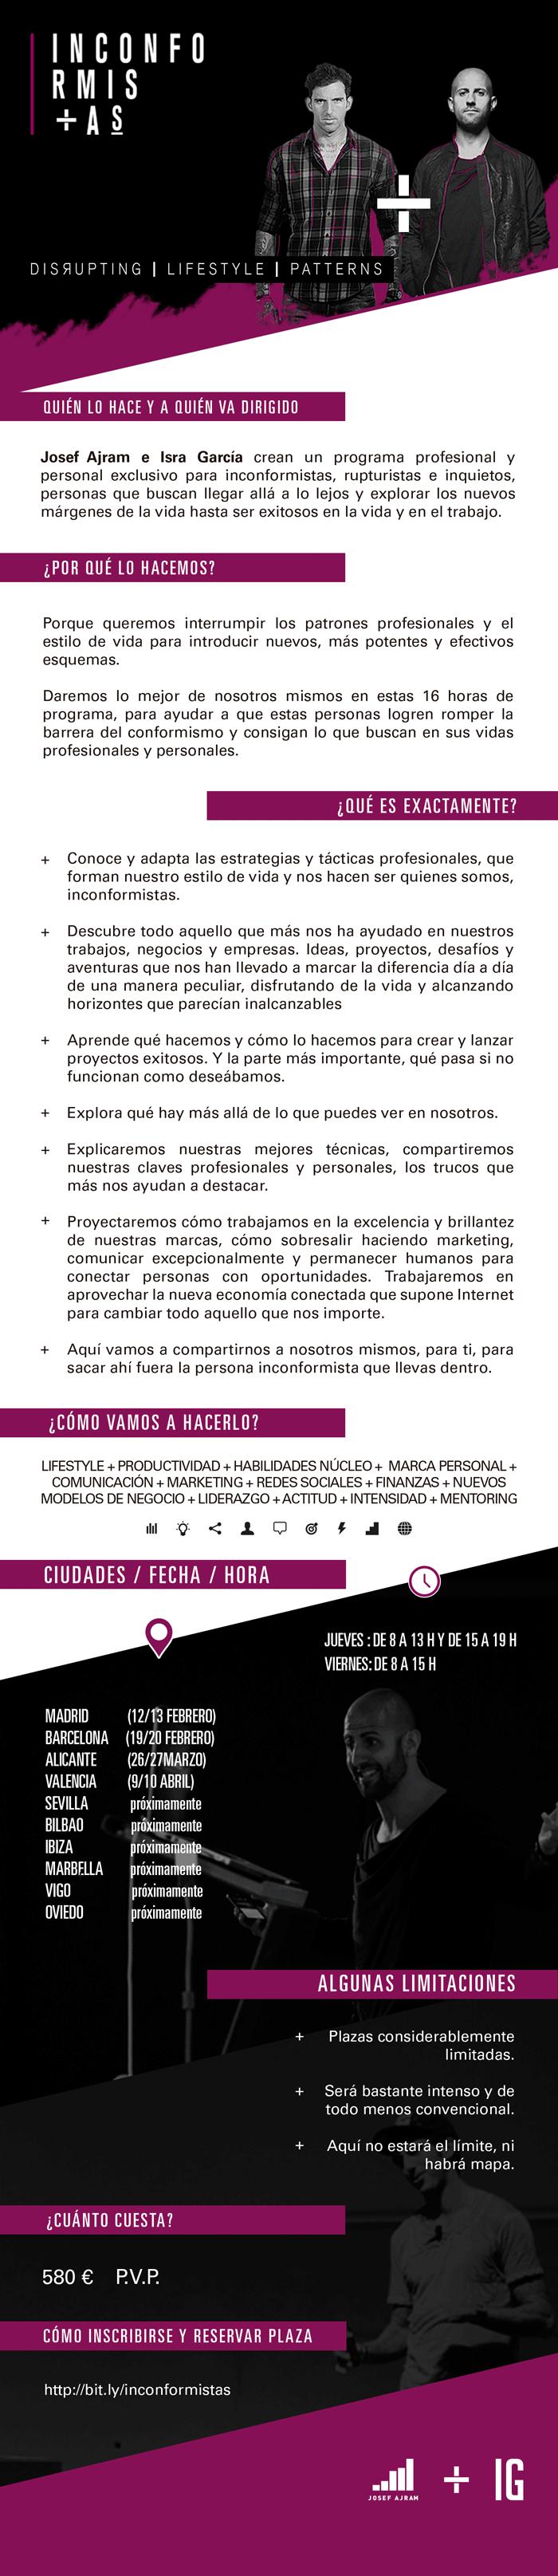 Inconformistas Josef Ajram Isra Garcia infografia Inconformistas